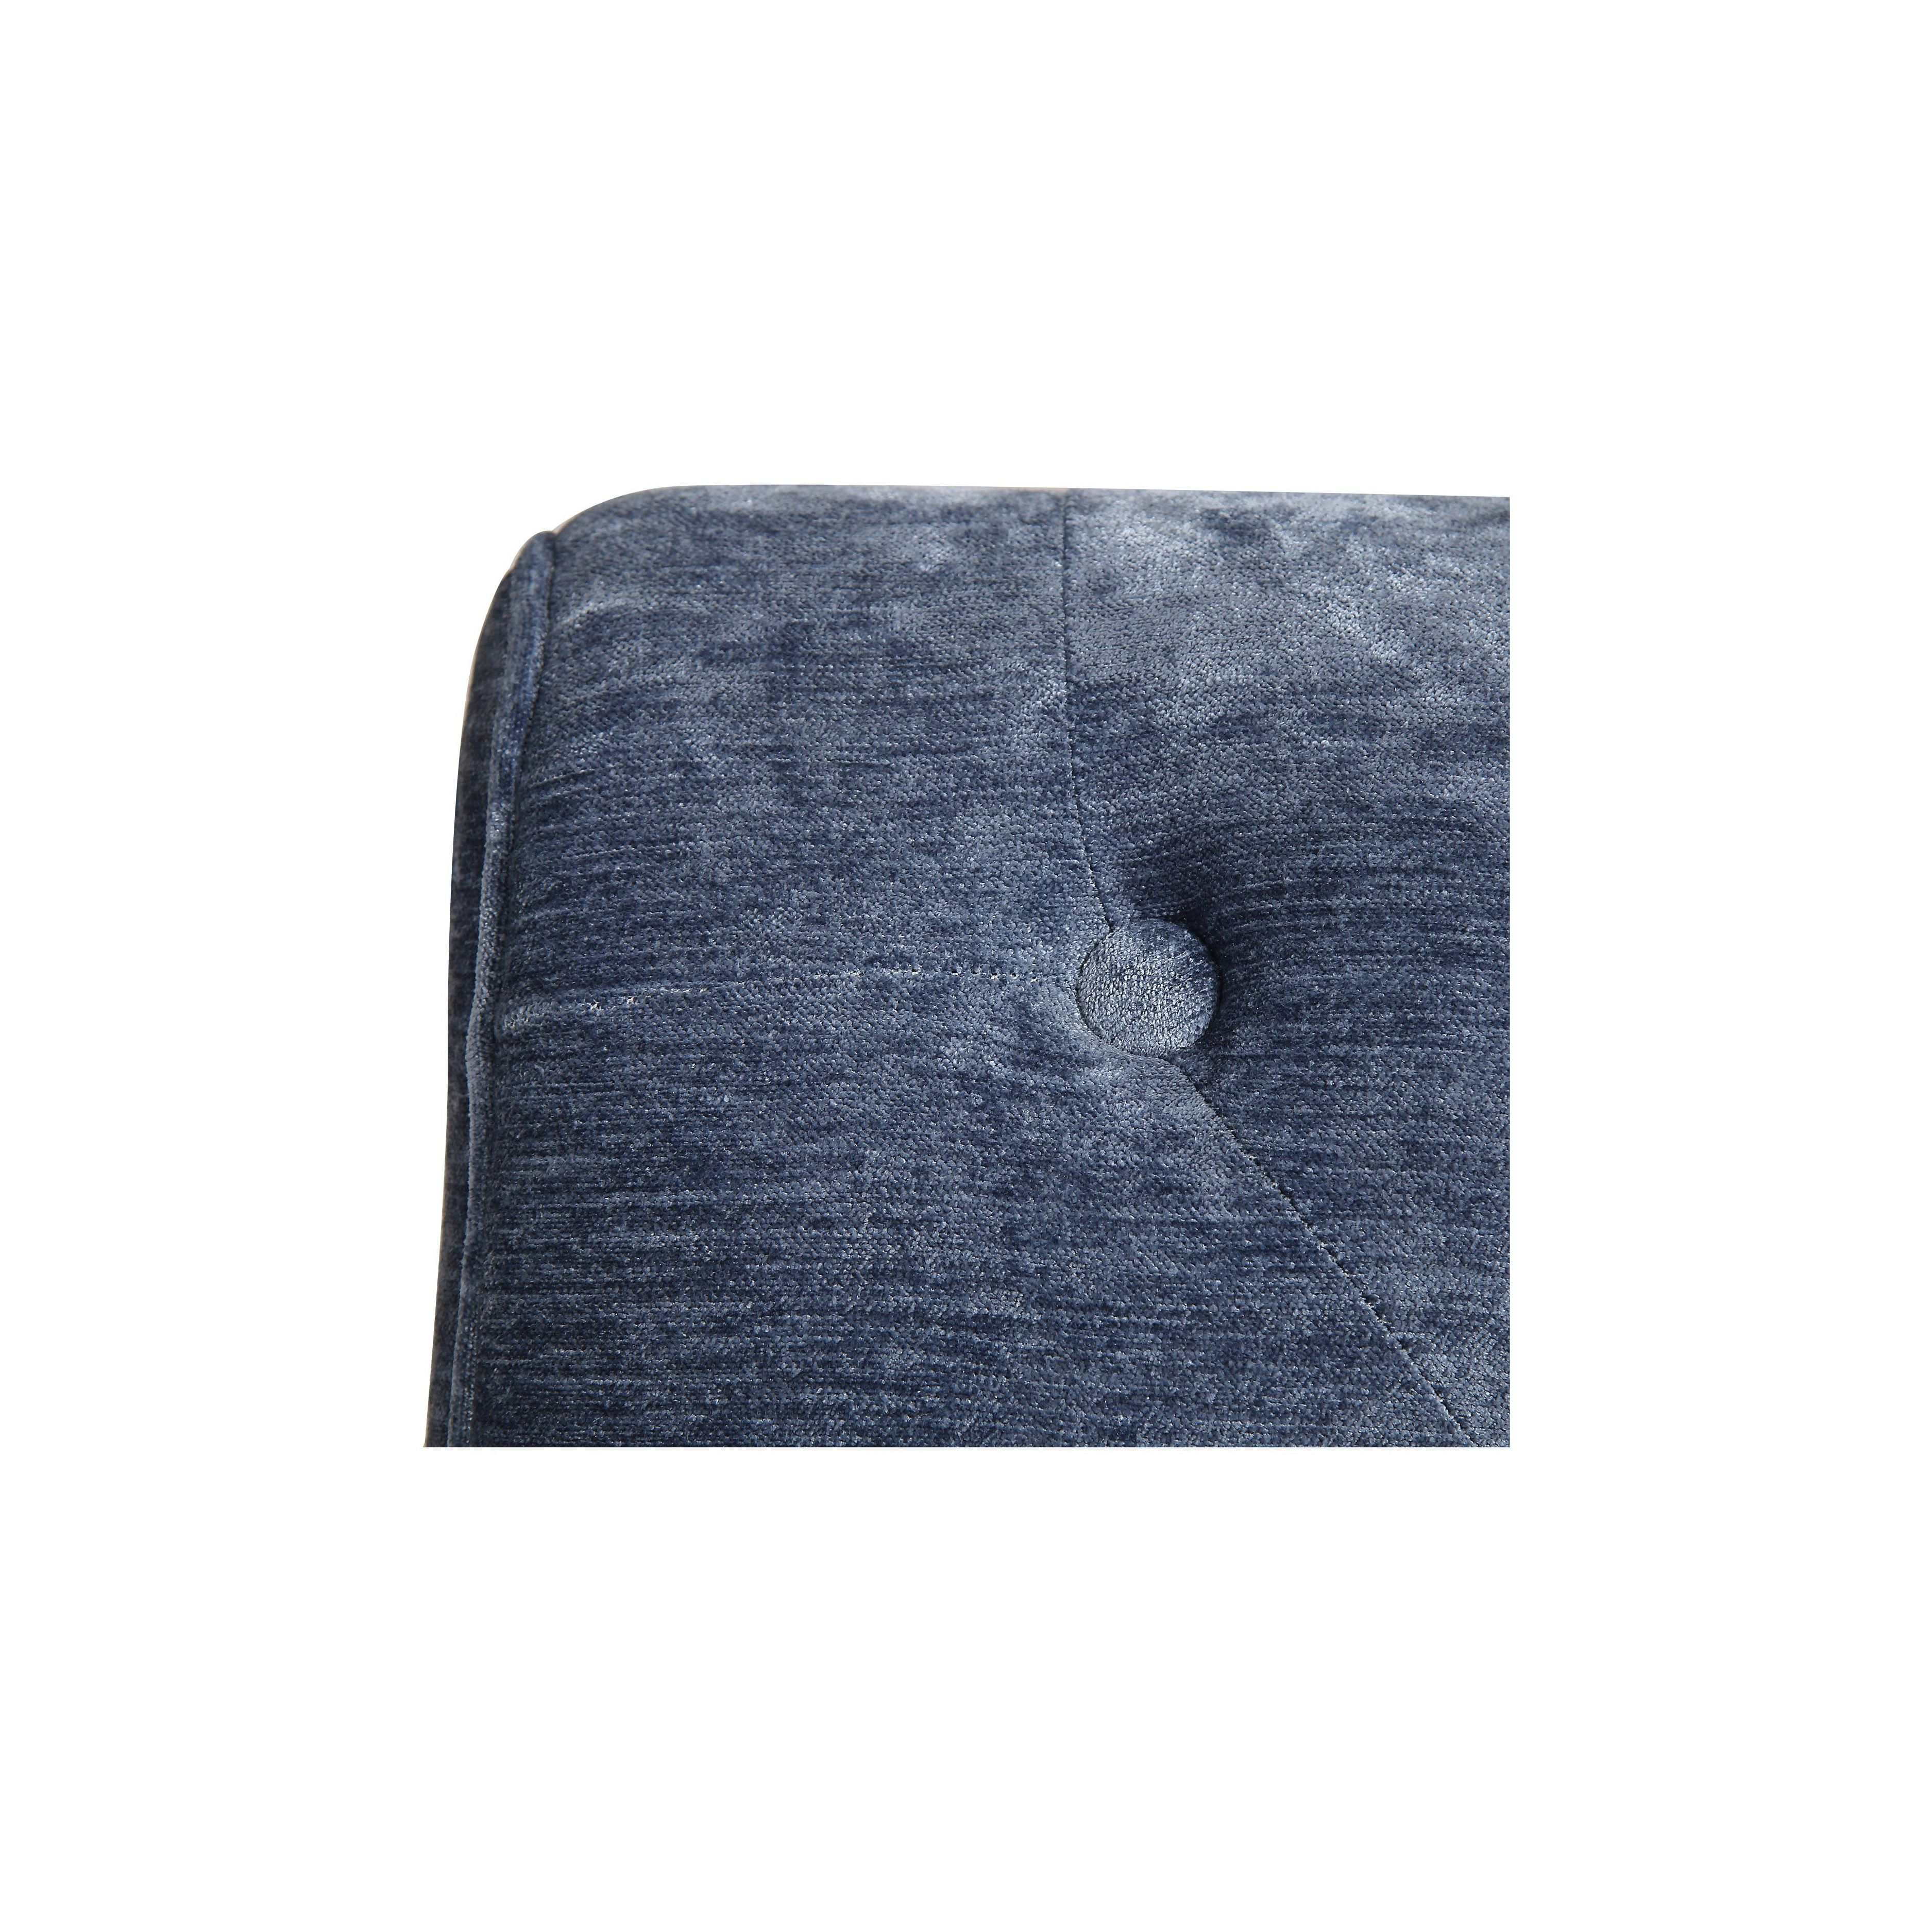 Fauteuil en tissu velours bleu - Léopold